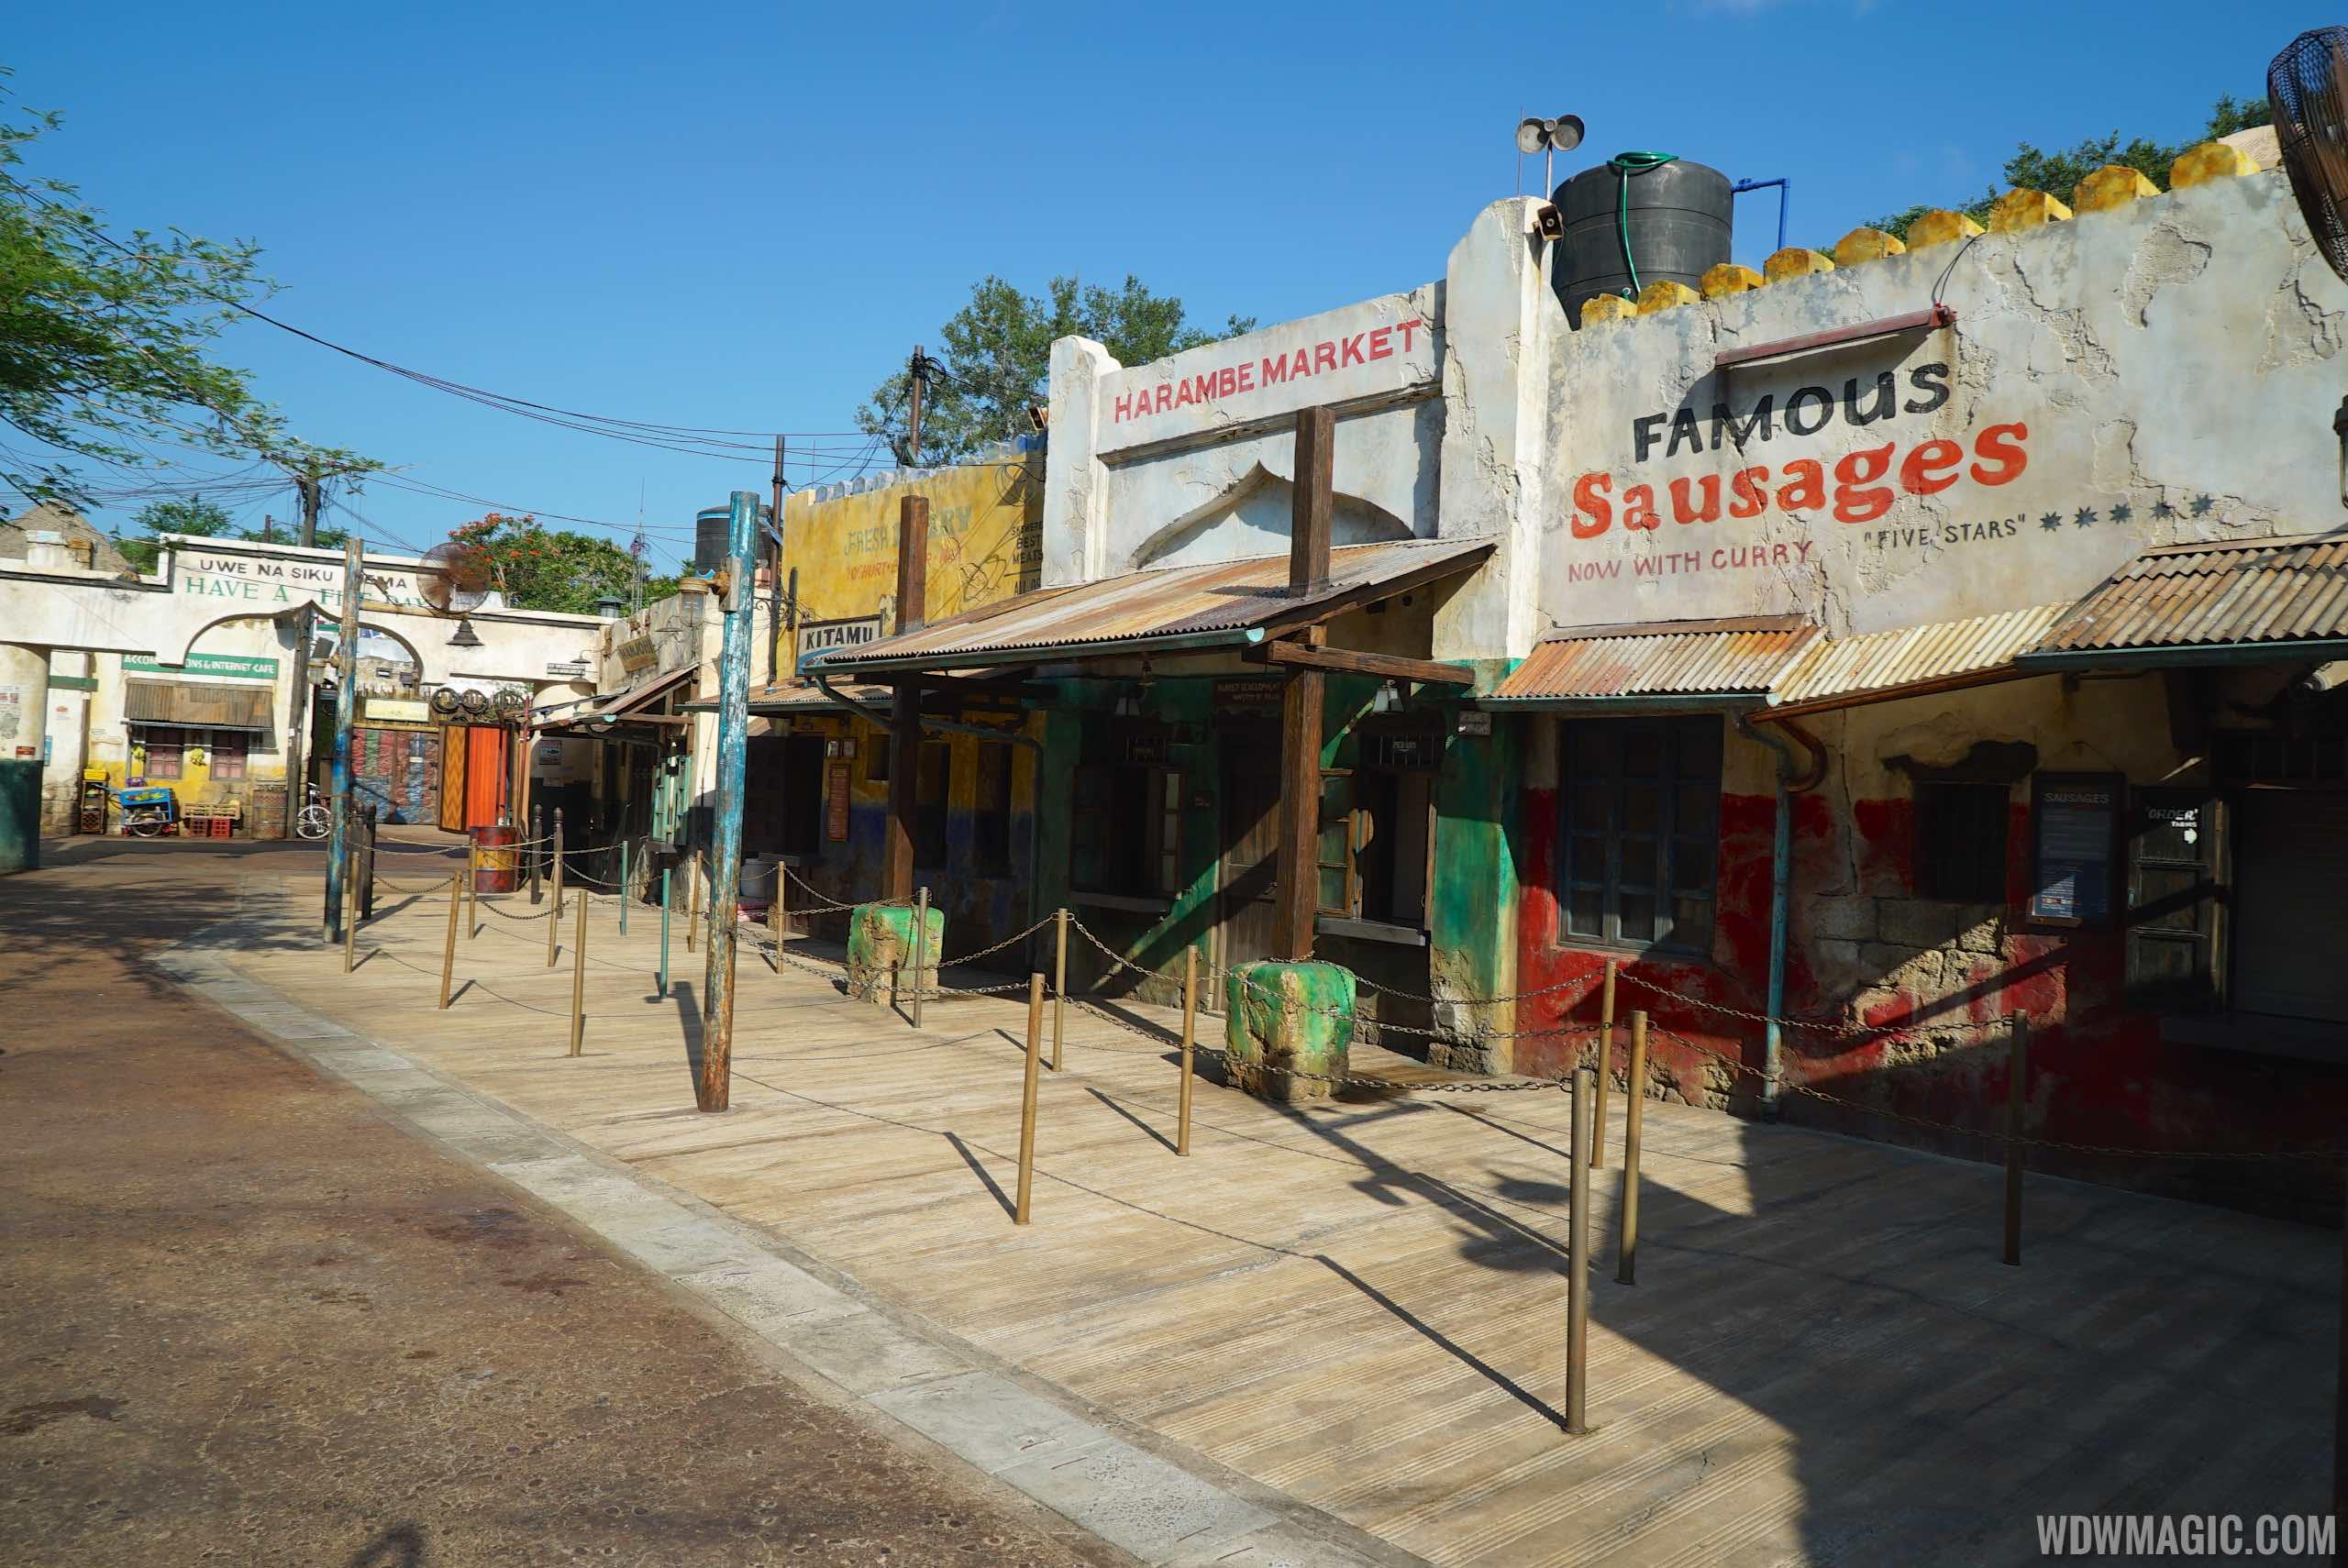 Harambe Market - The walkup windows